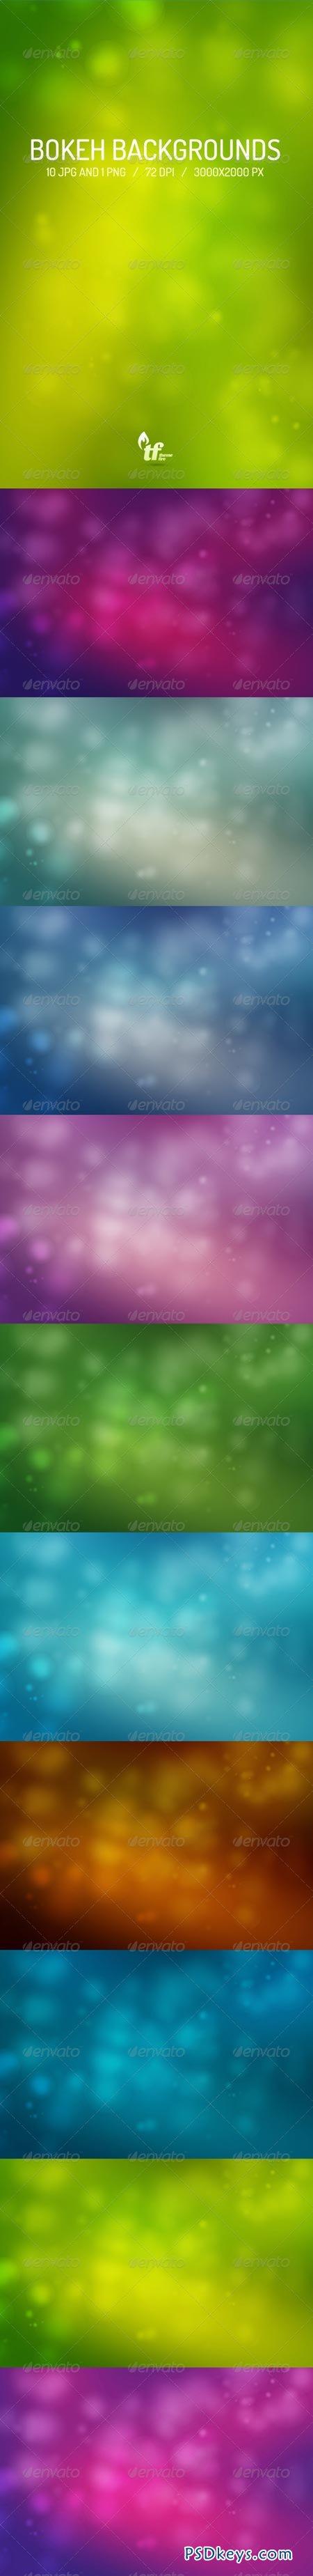 Bokeh Backgrounds 6617882